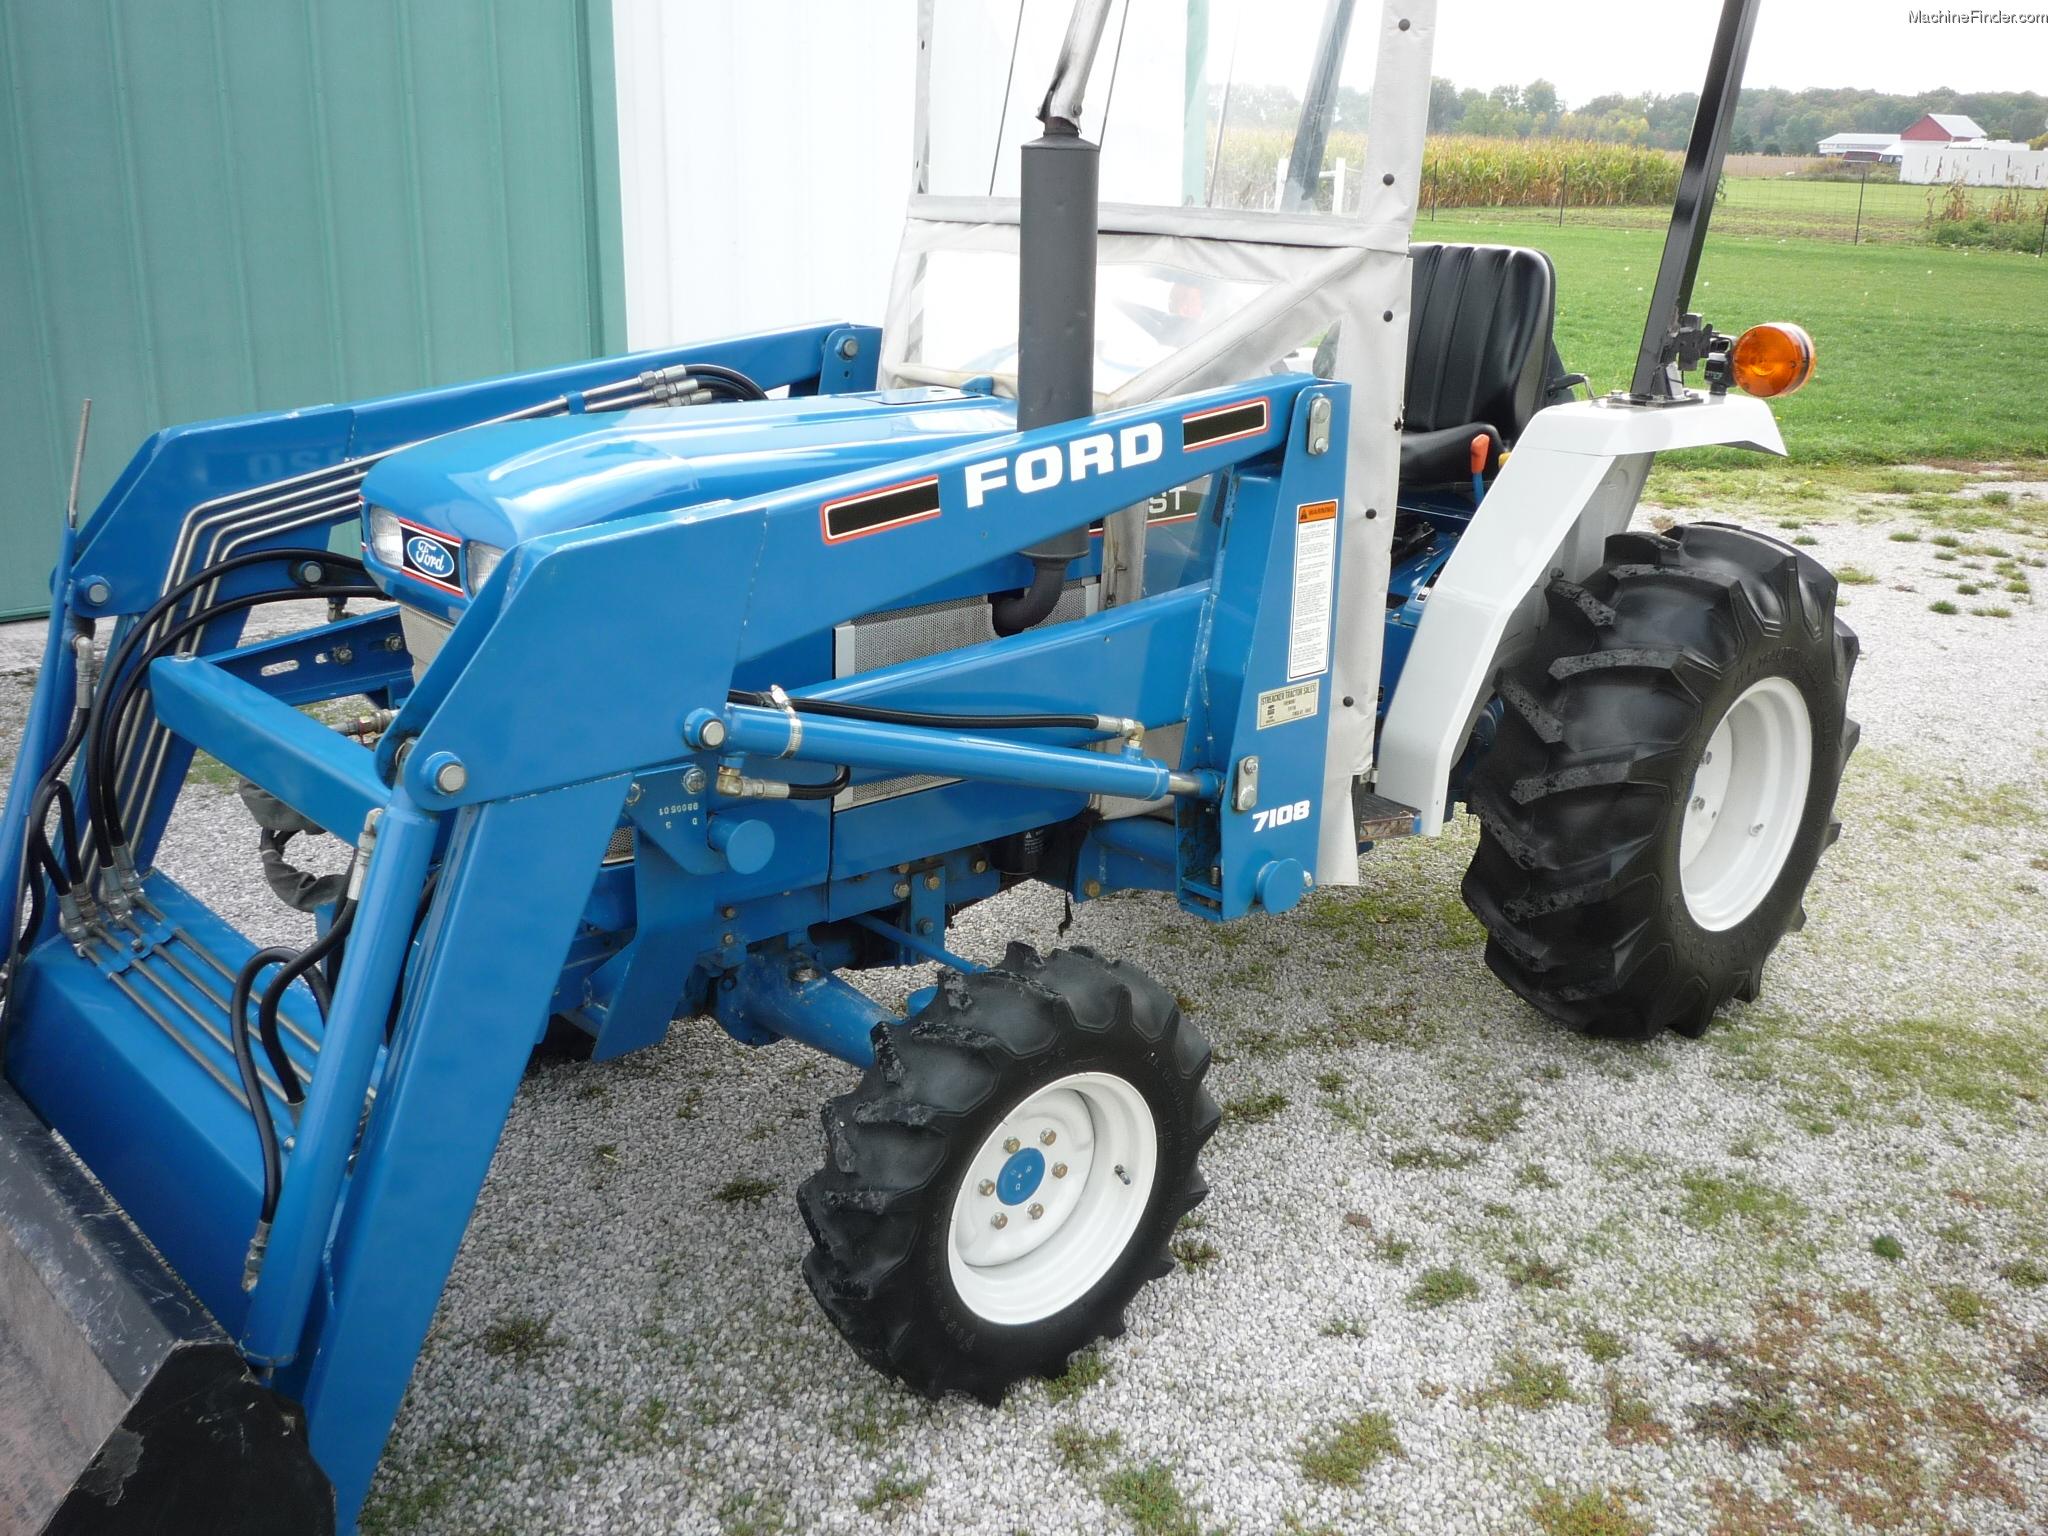 Ford 1320 Tractor Parts Headlights : Tweet